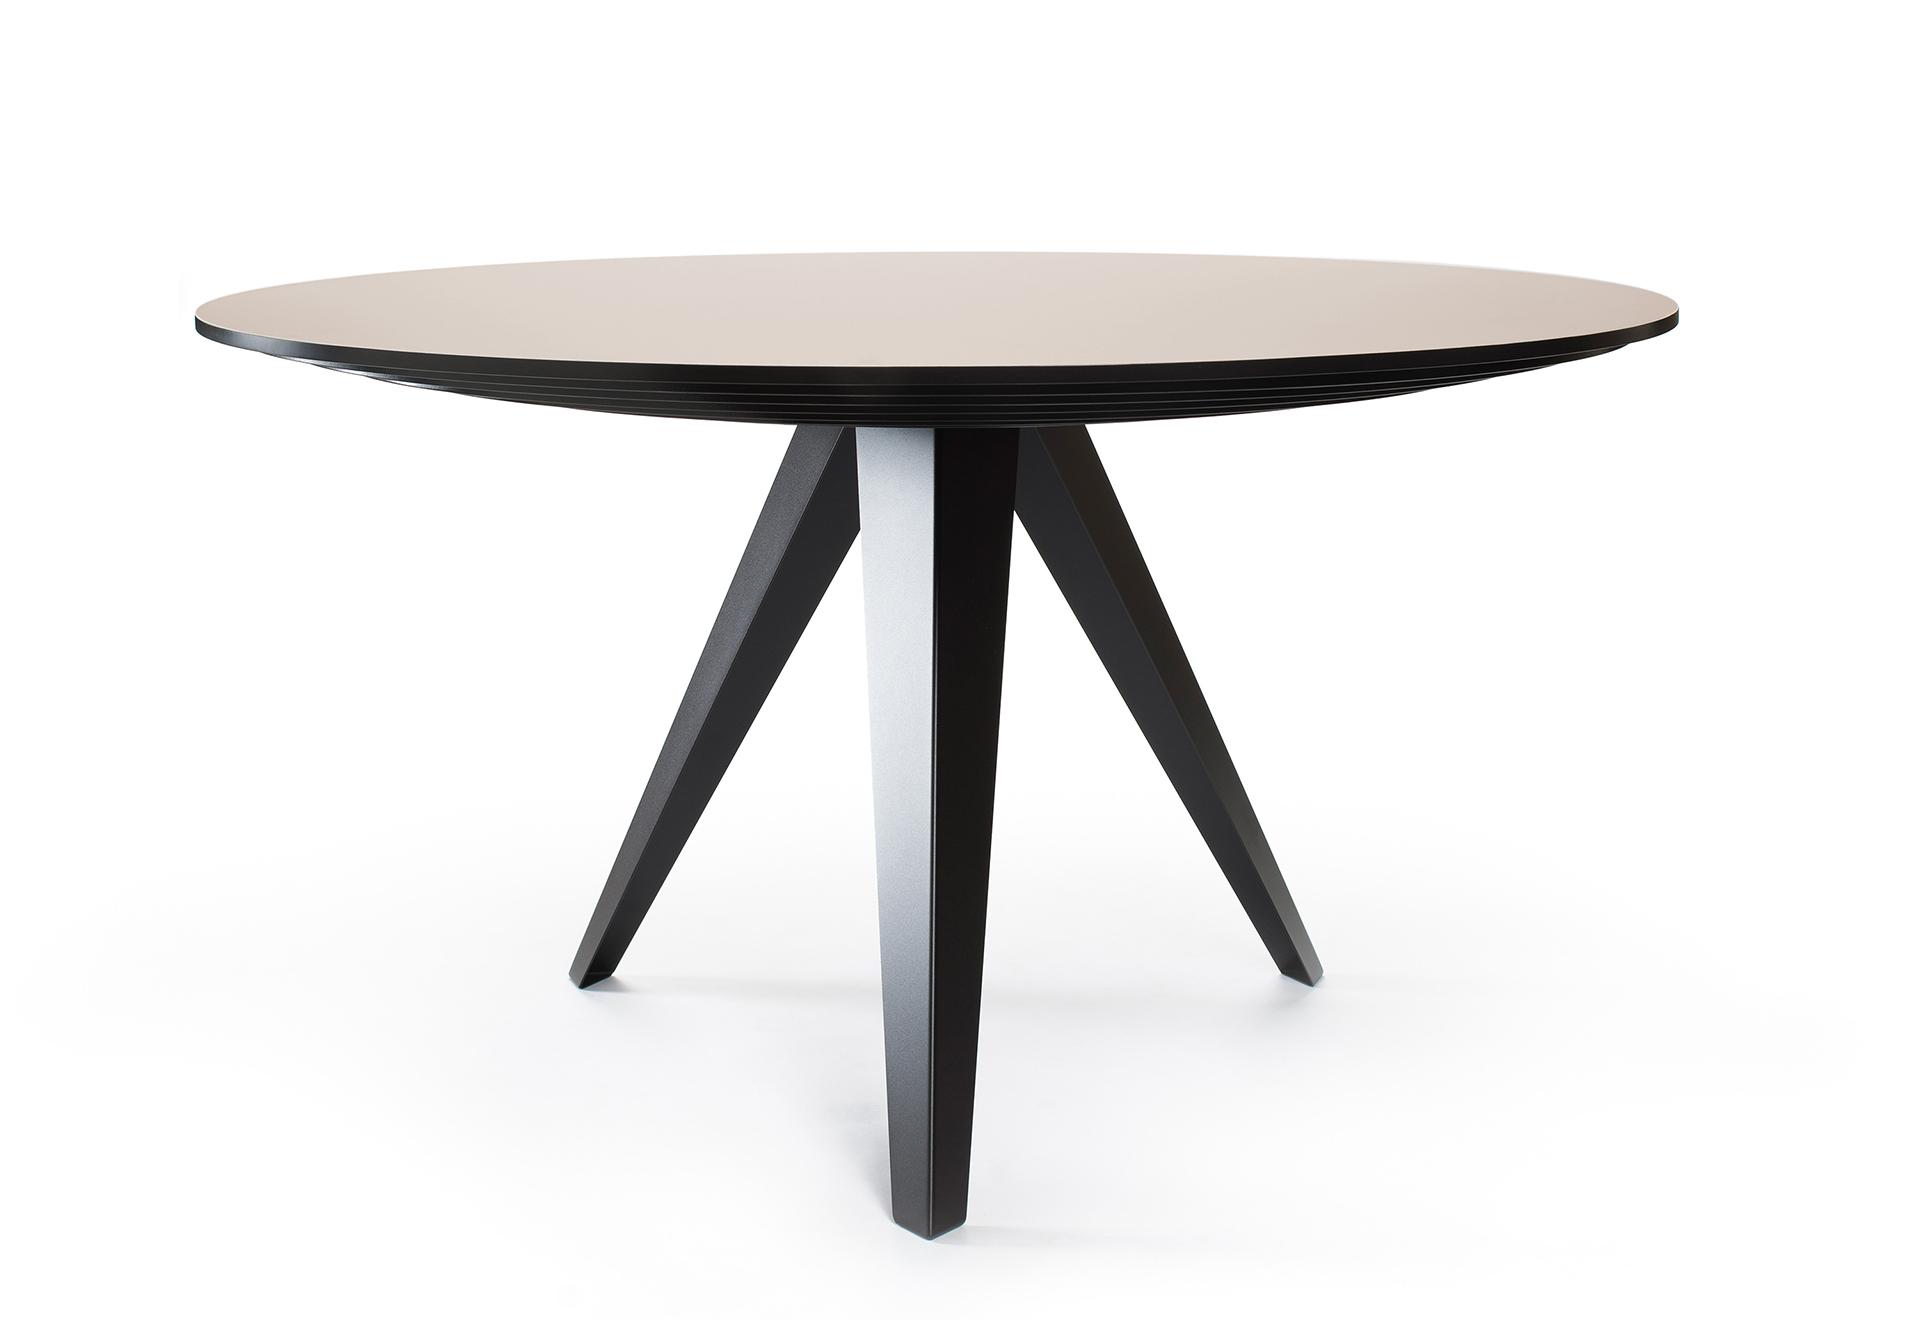 Tafelblad 140 Cm.Round Dining Table Belly L Kees Marcelis L Odesi Your Dutch Design